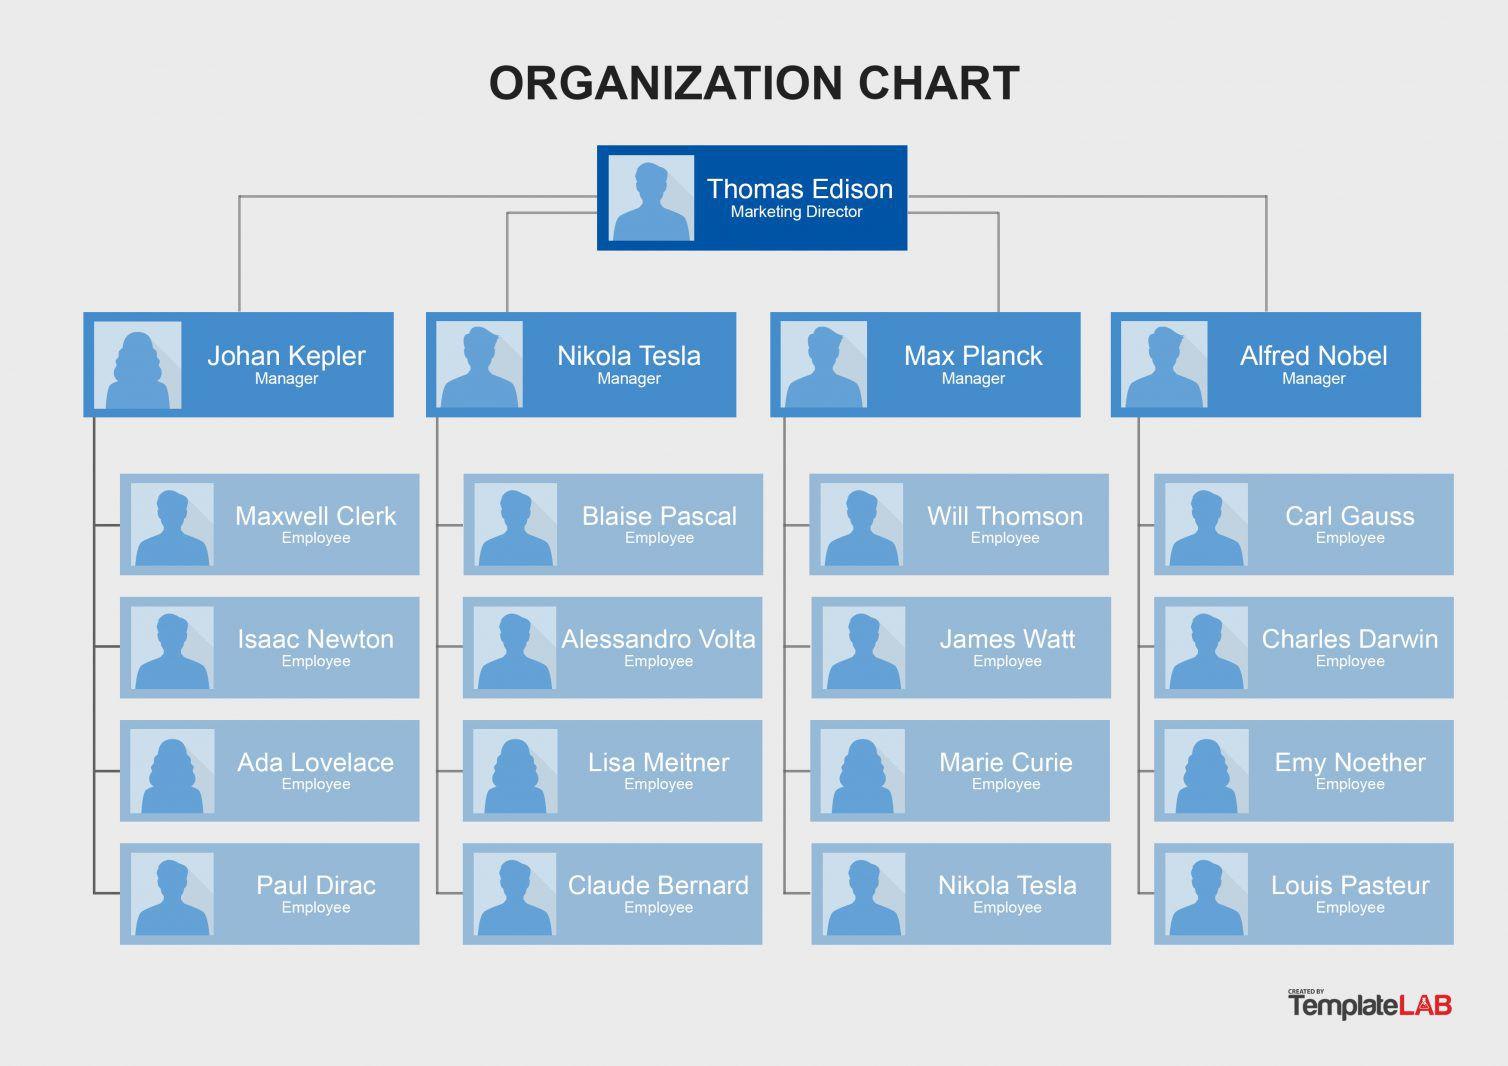 006 Impressive Organizational Chart Template Word Sample  2013 2010 2007Full